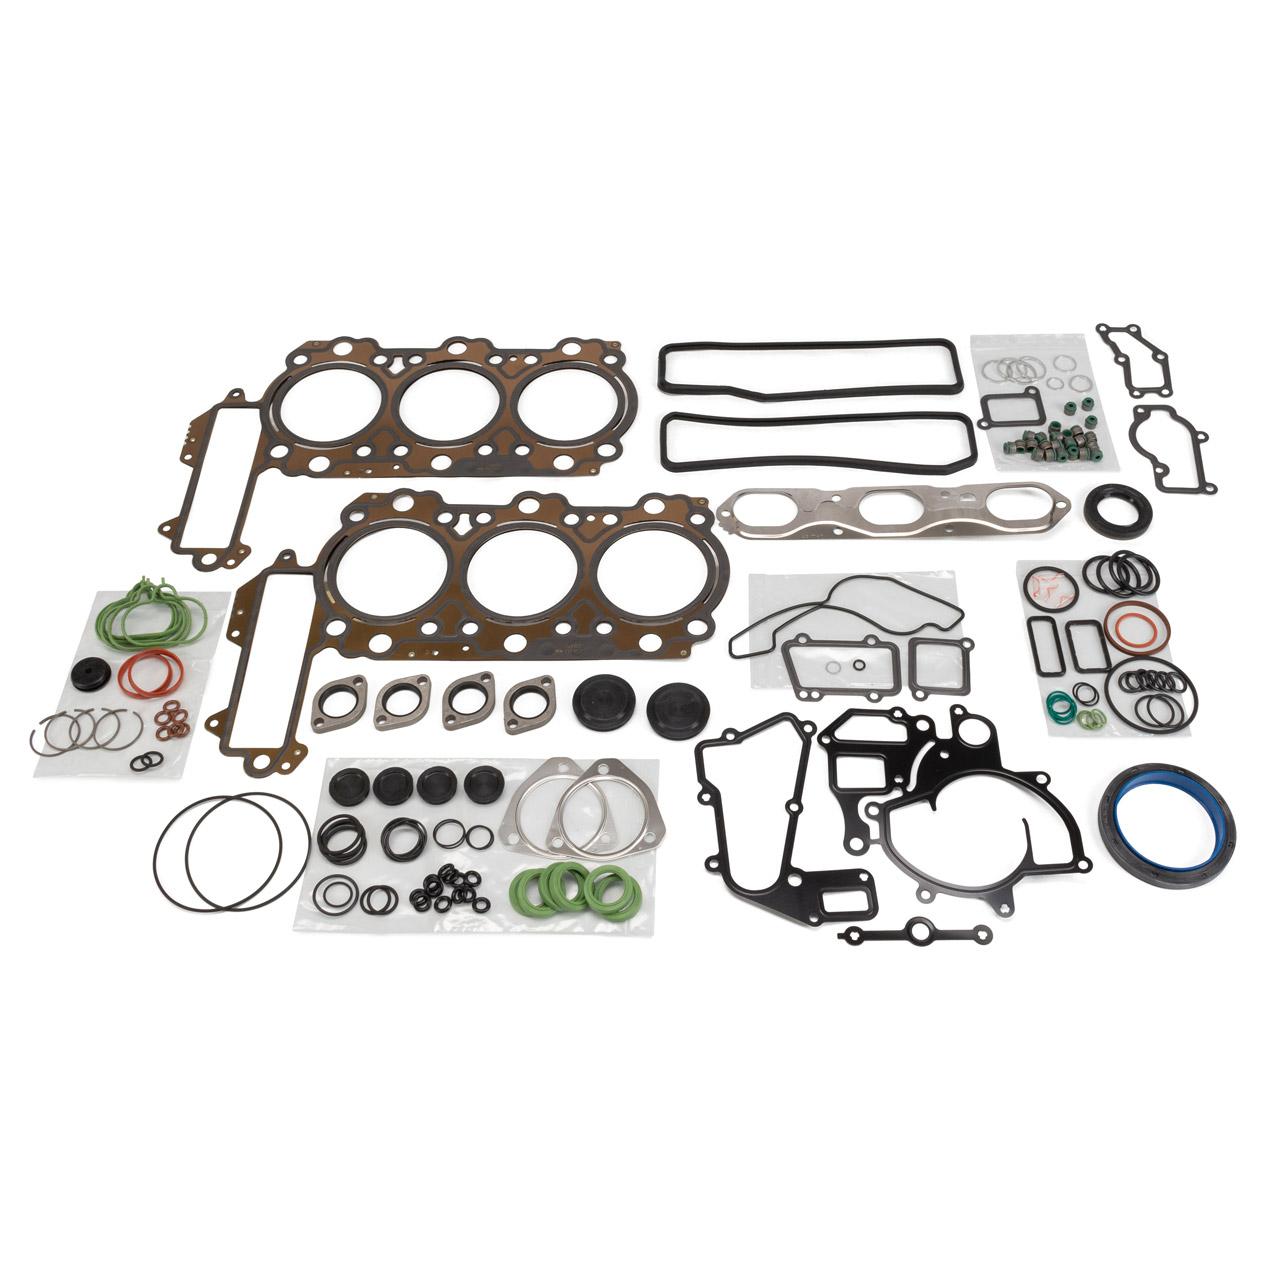 Motordichtungssatz PORSCHE 911 997 3.8 Carrera S 355-381 PS M97.01